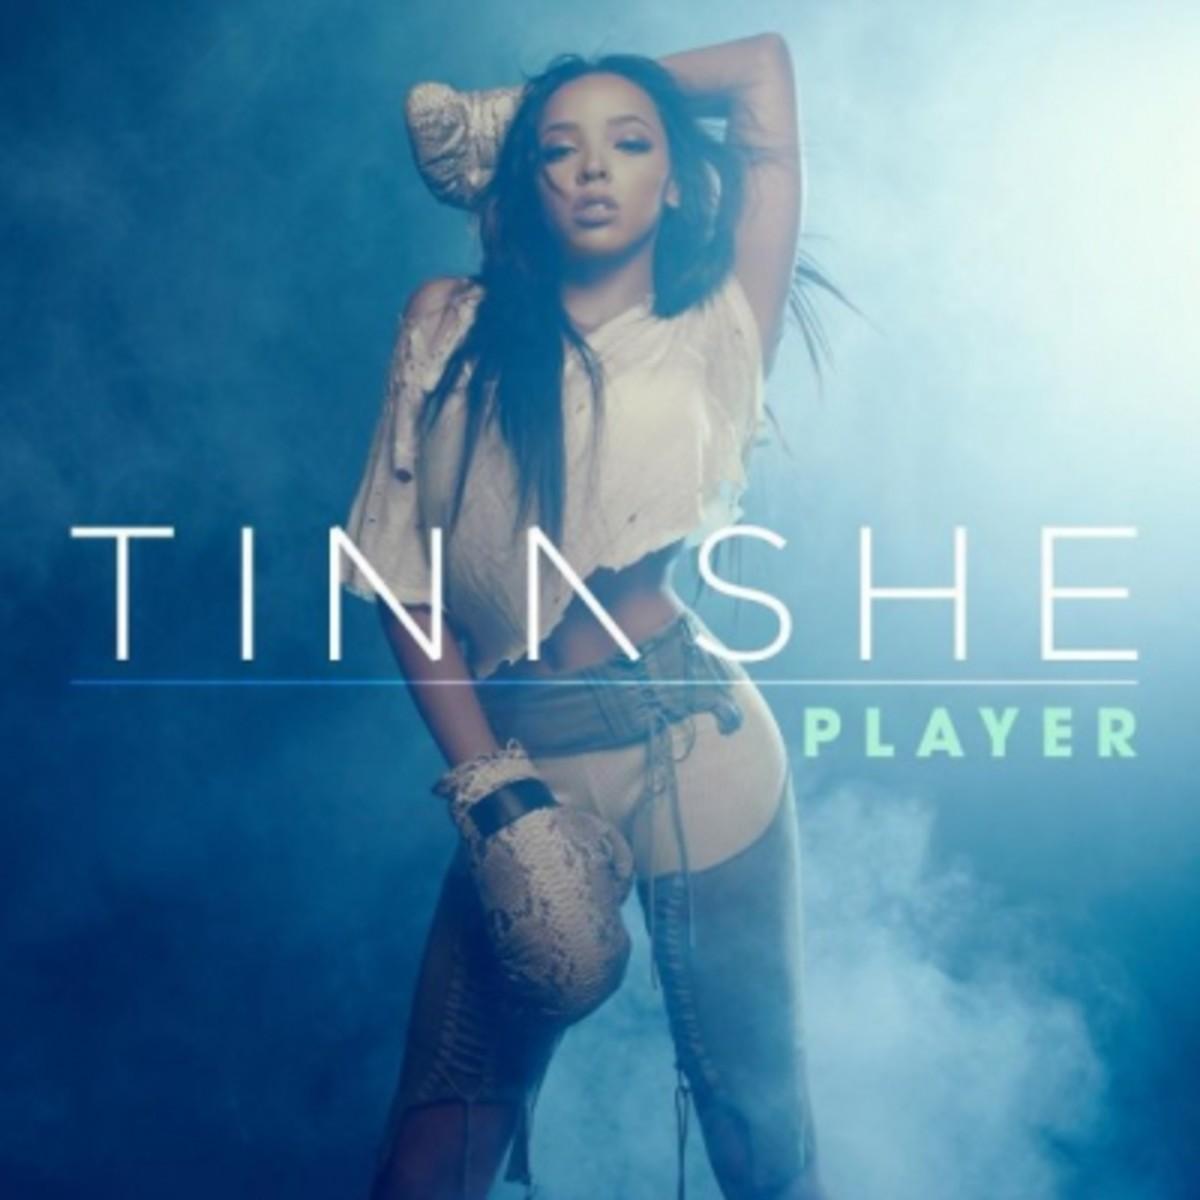 tinashe-player.jpg